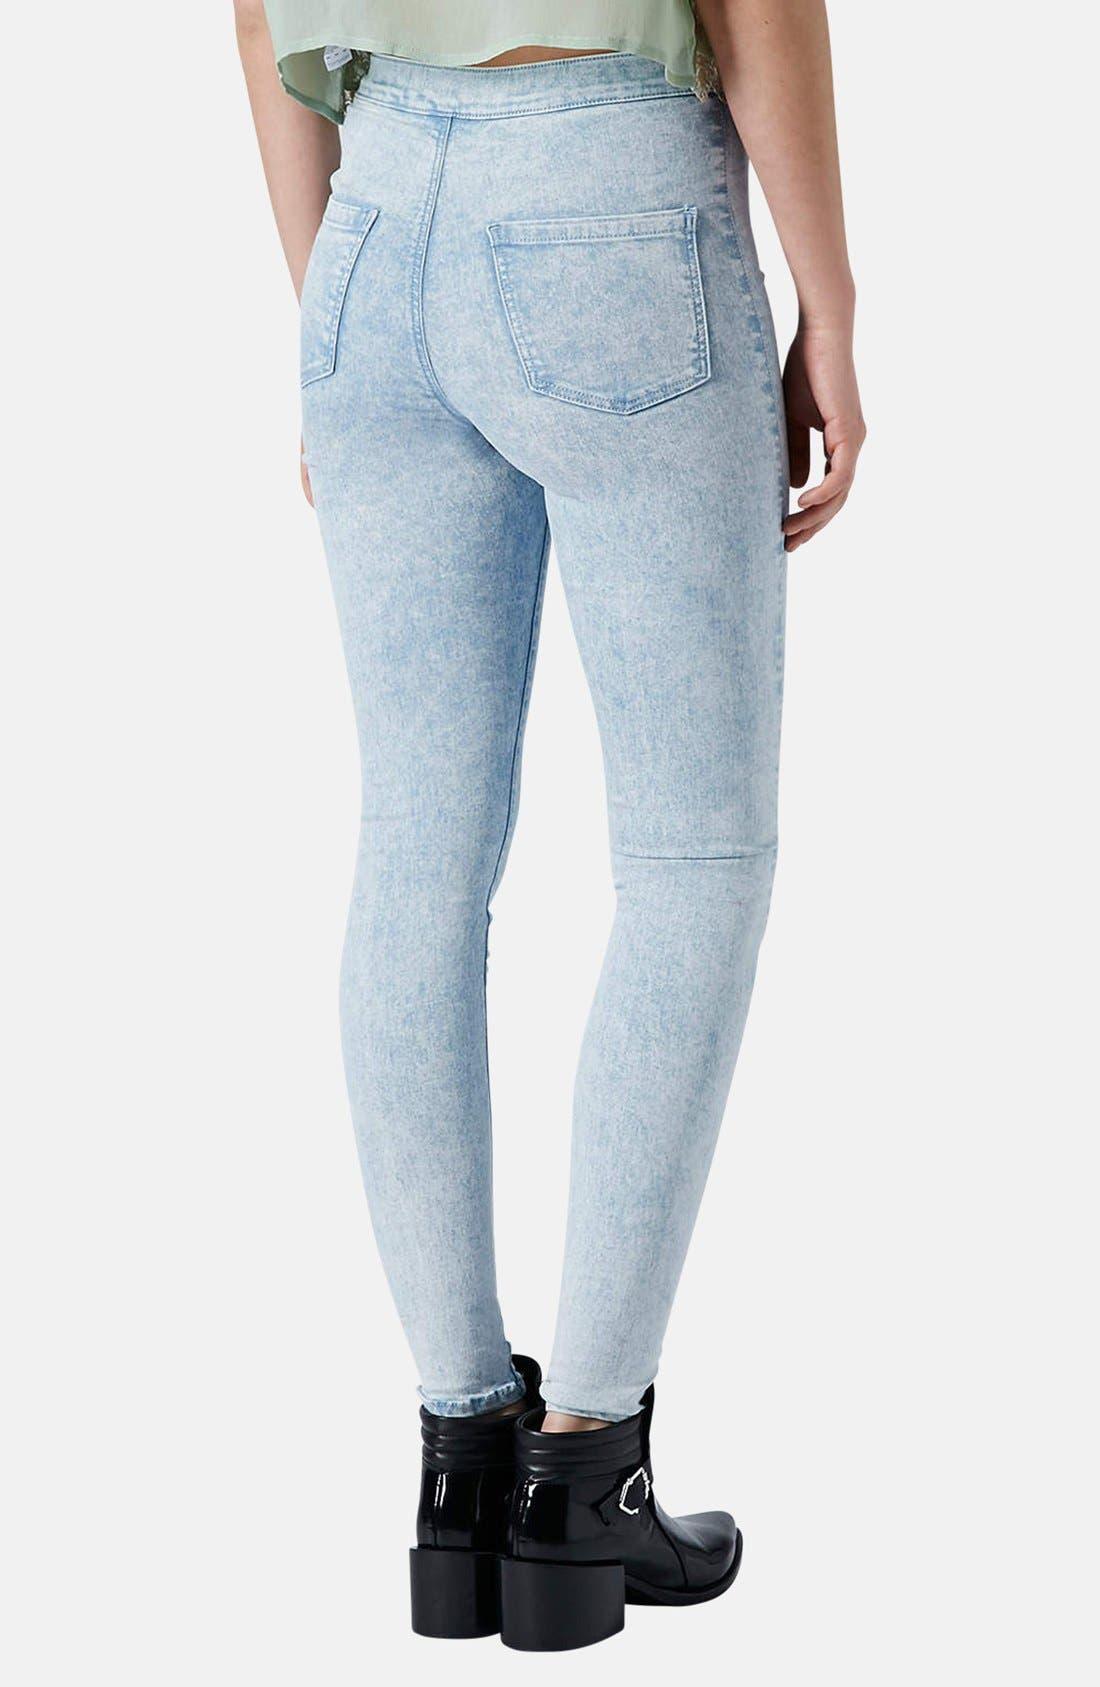 Alternate Image 2  - Topshop Moto 'Joni' Acid Wash High Rise Skinny Jeans (Light) (Regular & Short)